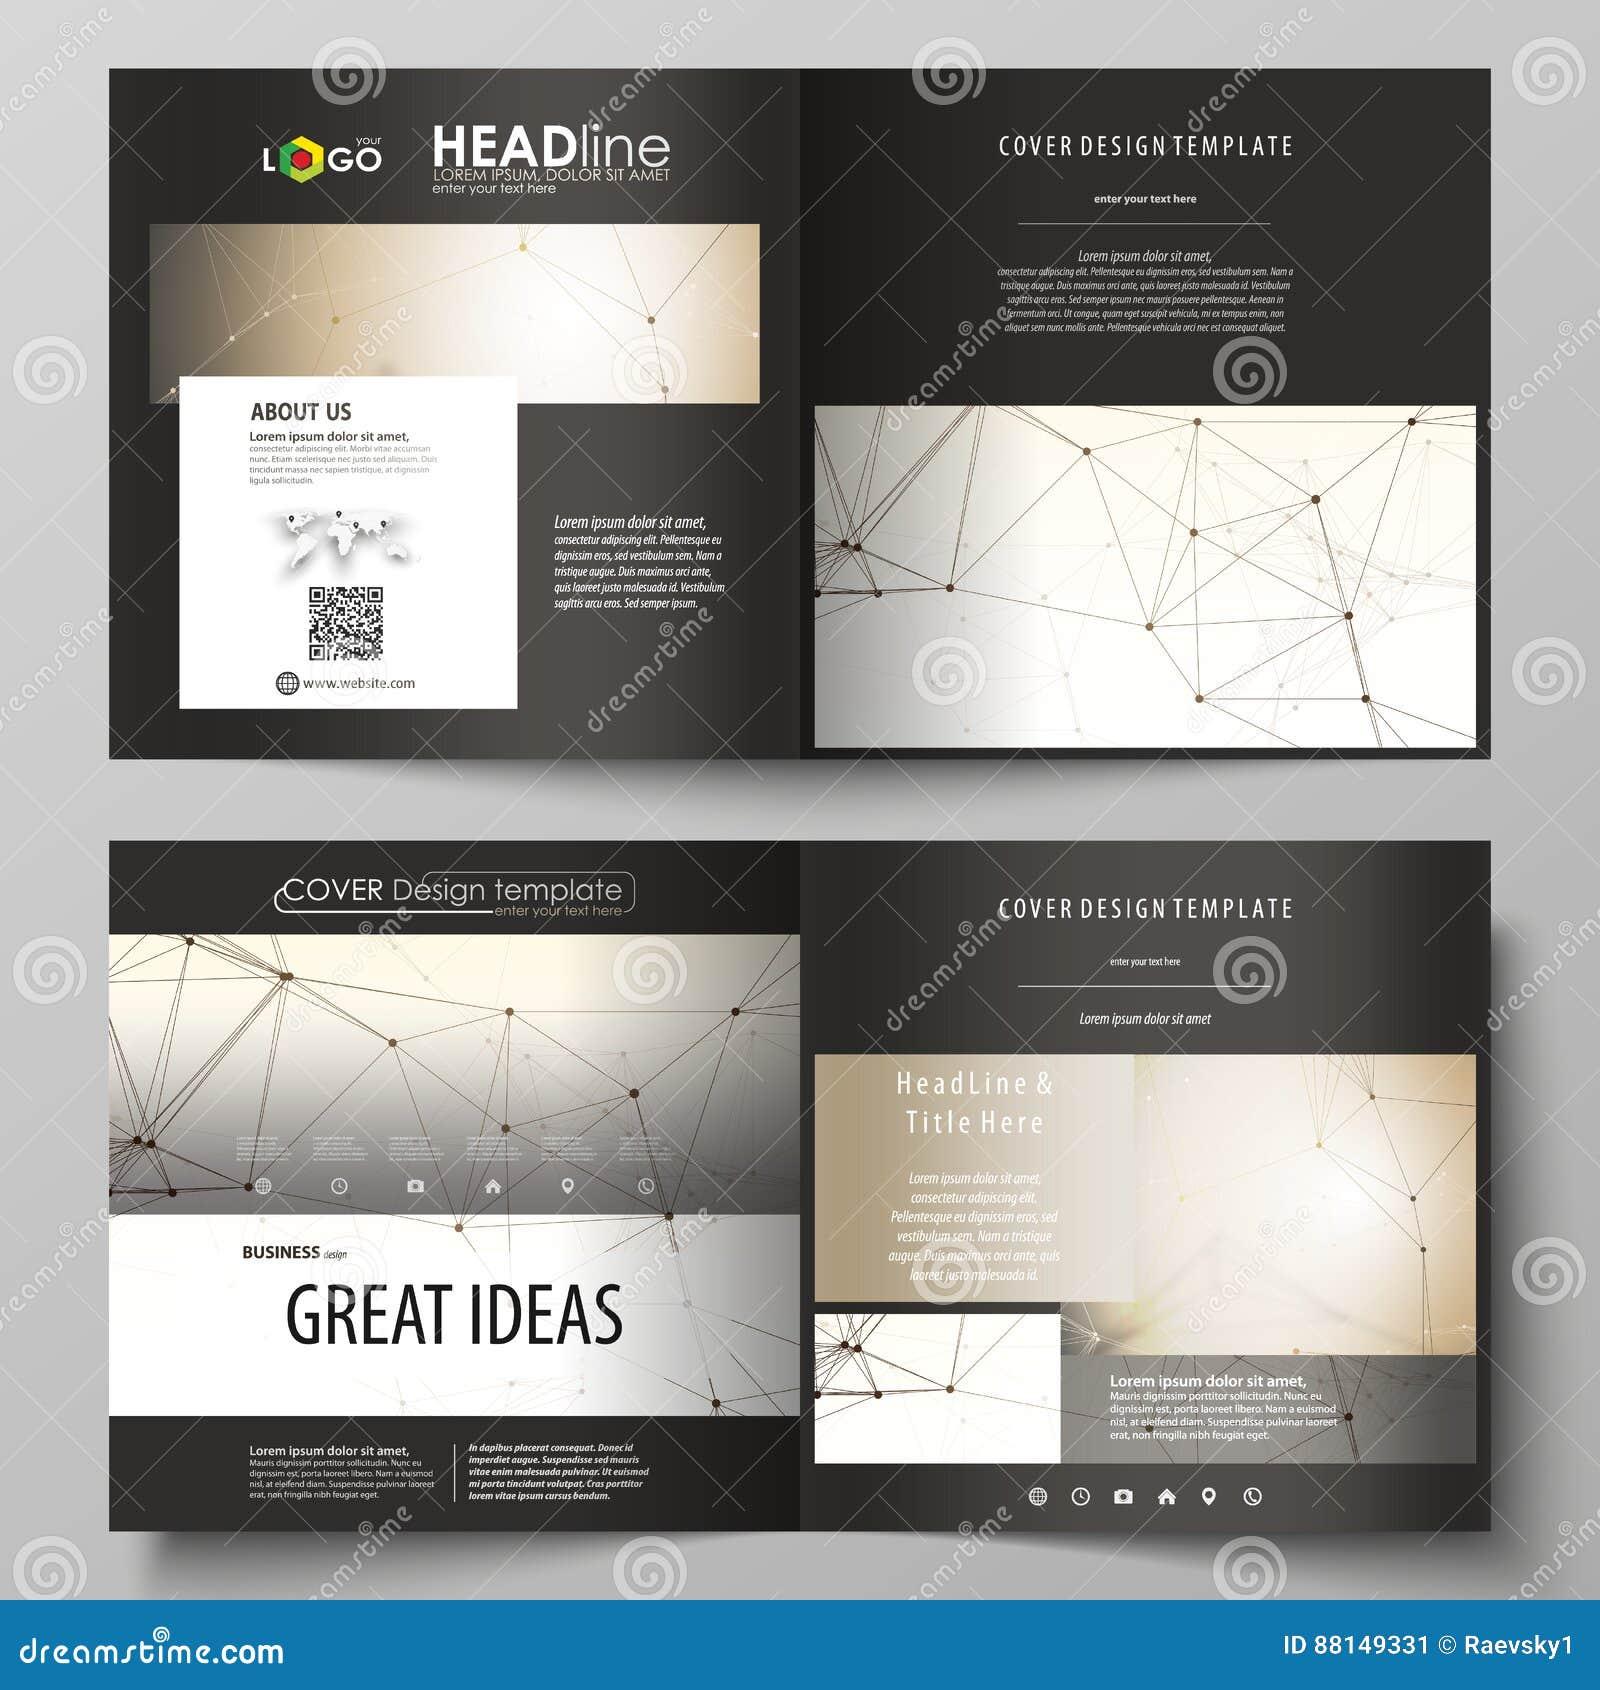 Download Business Templates For Square Design Bi Fold Brochure Flyer Booklet Report